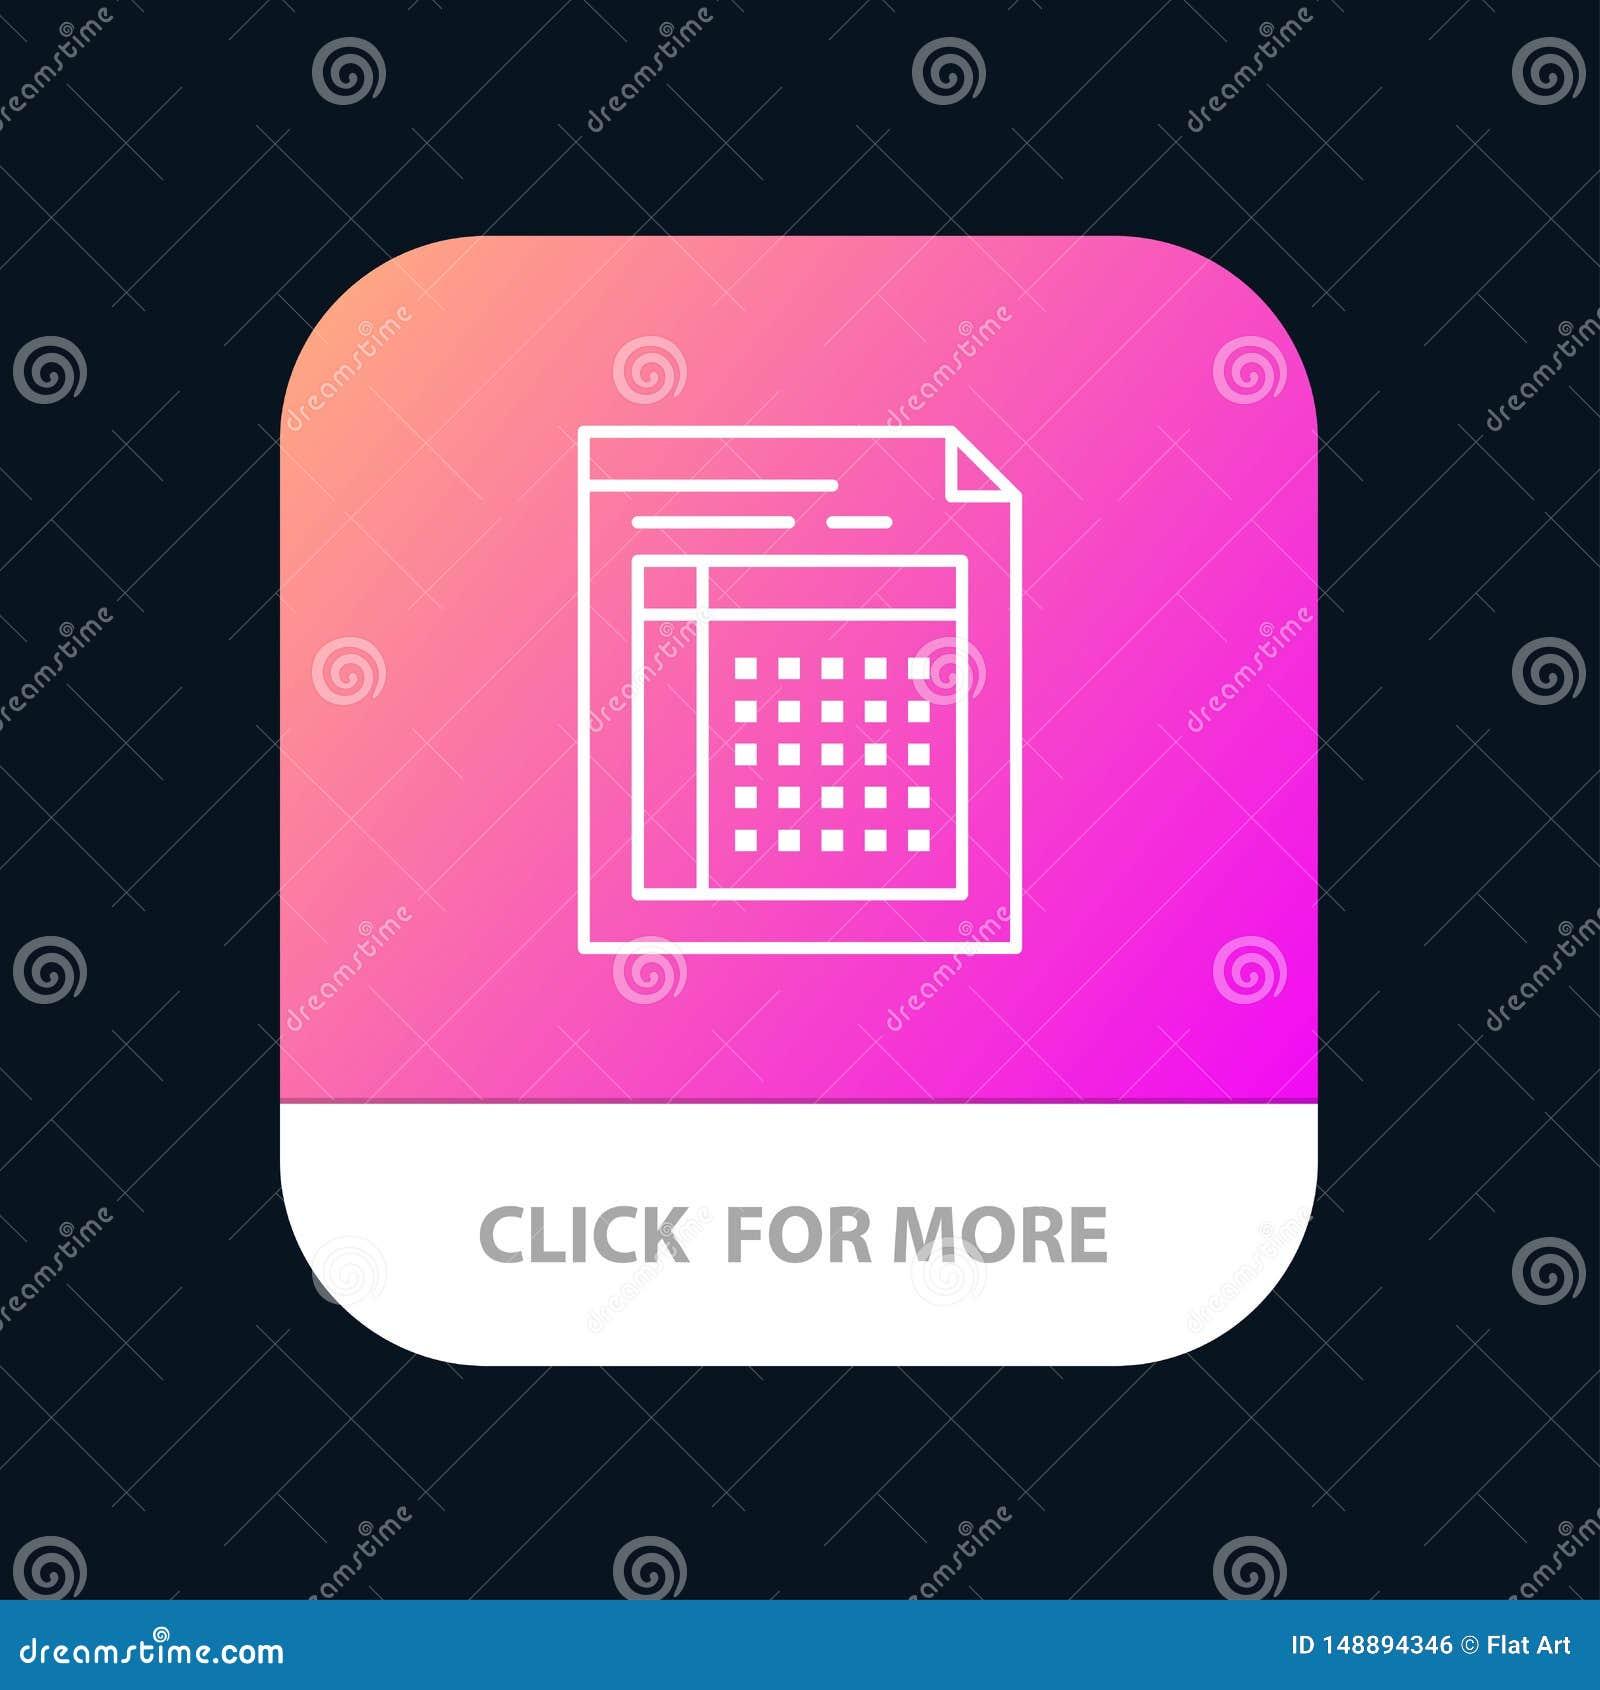 Audit, Bill, Document, File, Form, Invoice, Paper, Sheet